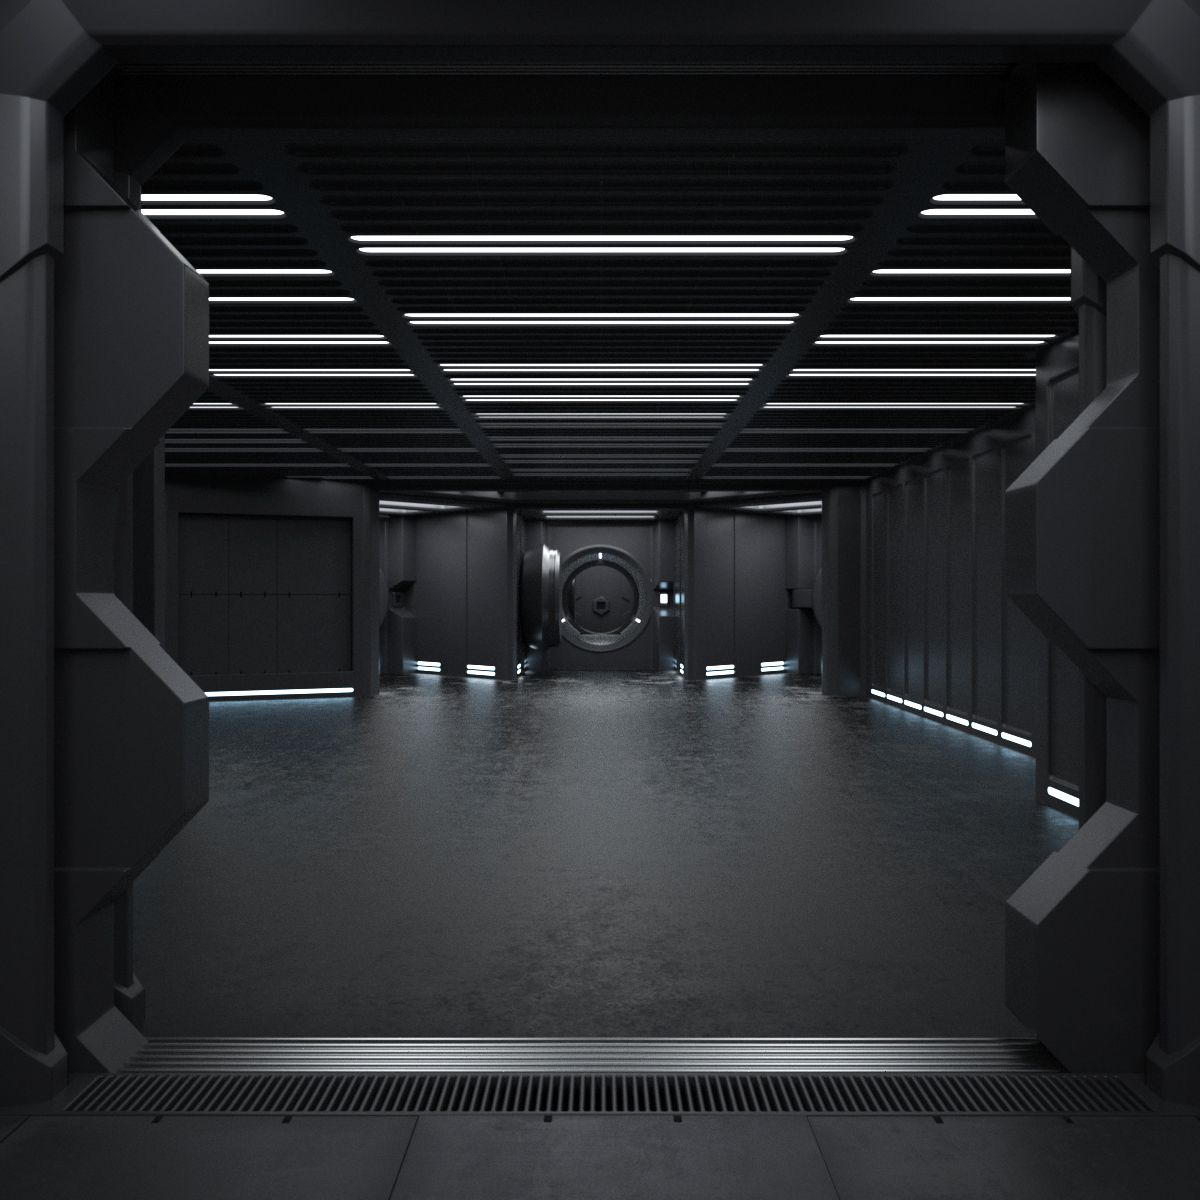 6 tumblr perspective spaceship interior futuristic for Sci fi decor